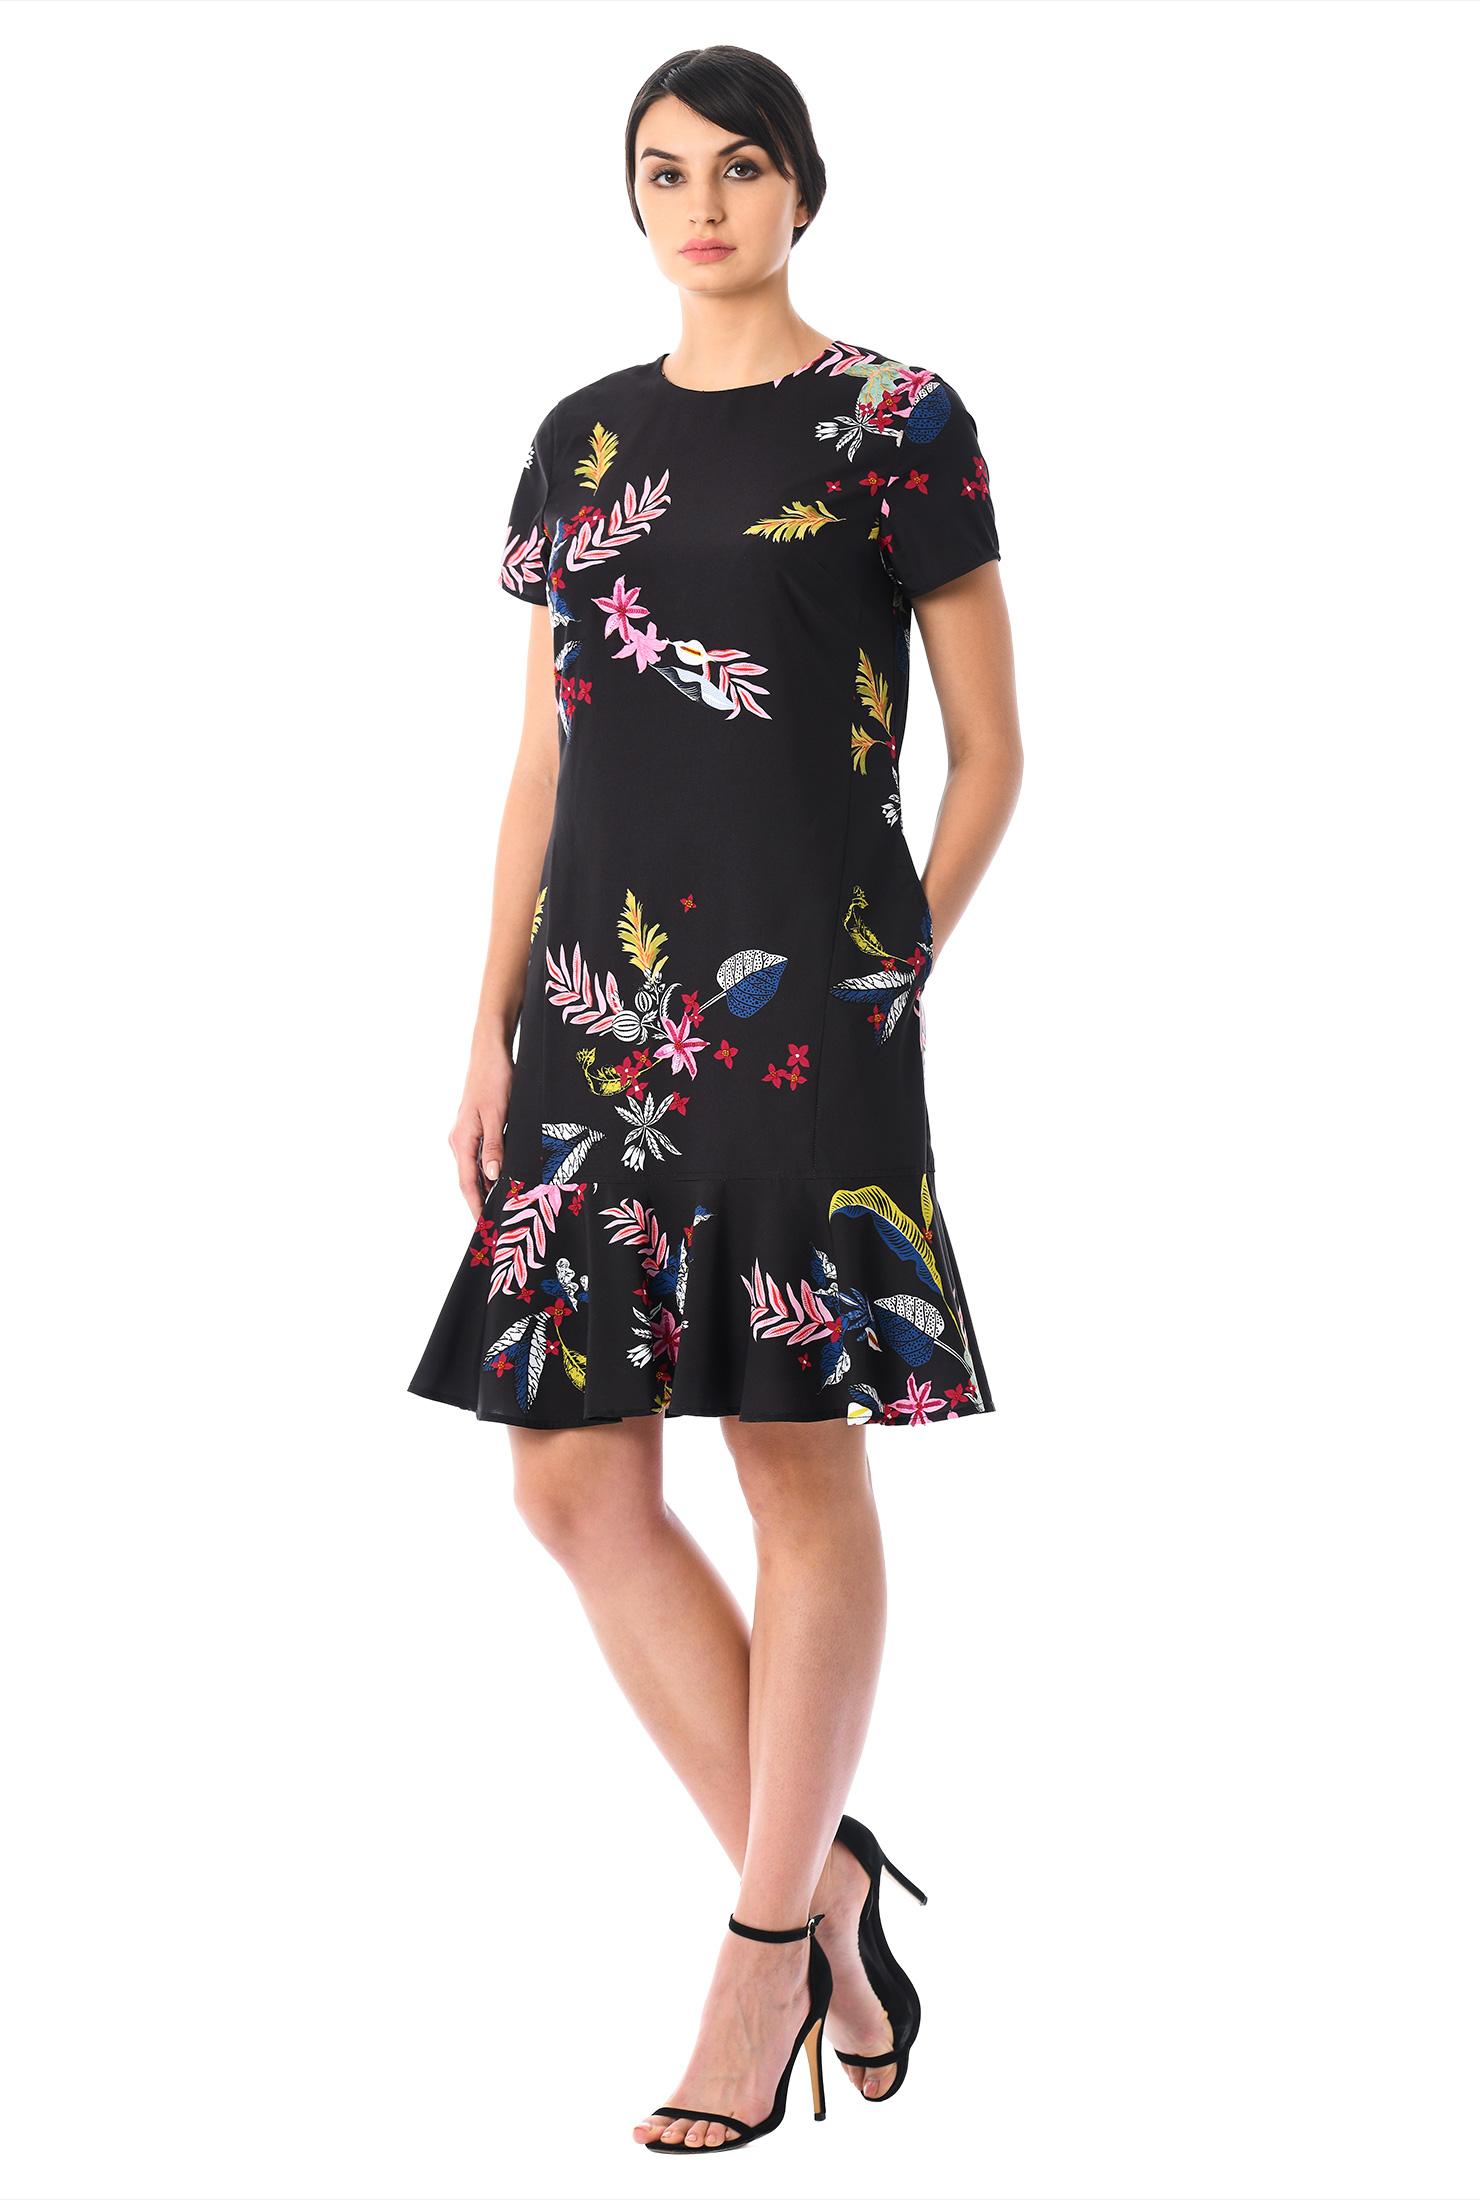 499bb0f884 Women s Fashion Clothing 0-36W and Custom